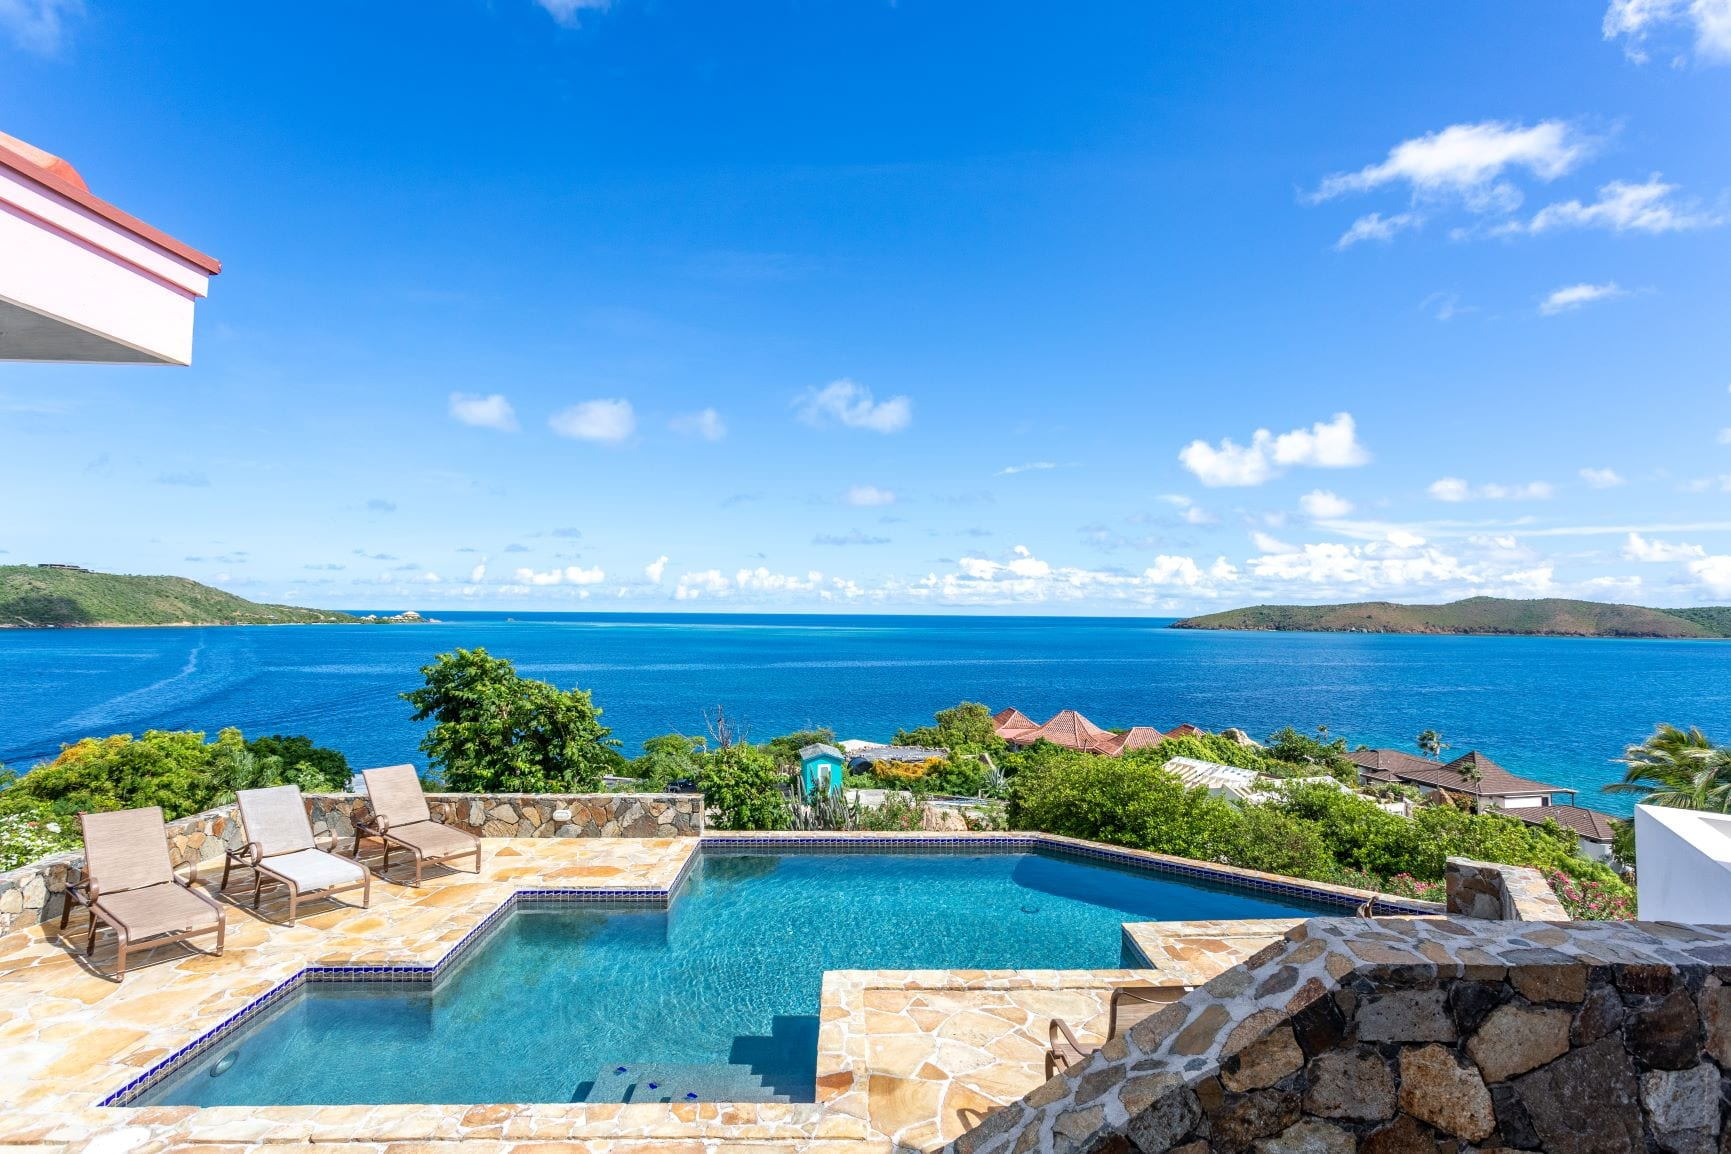 BVI Property Spyglass Villa (under offer) featured image